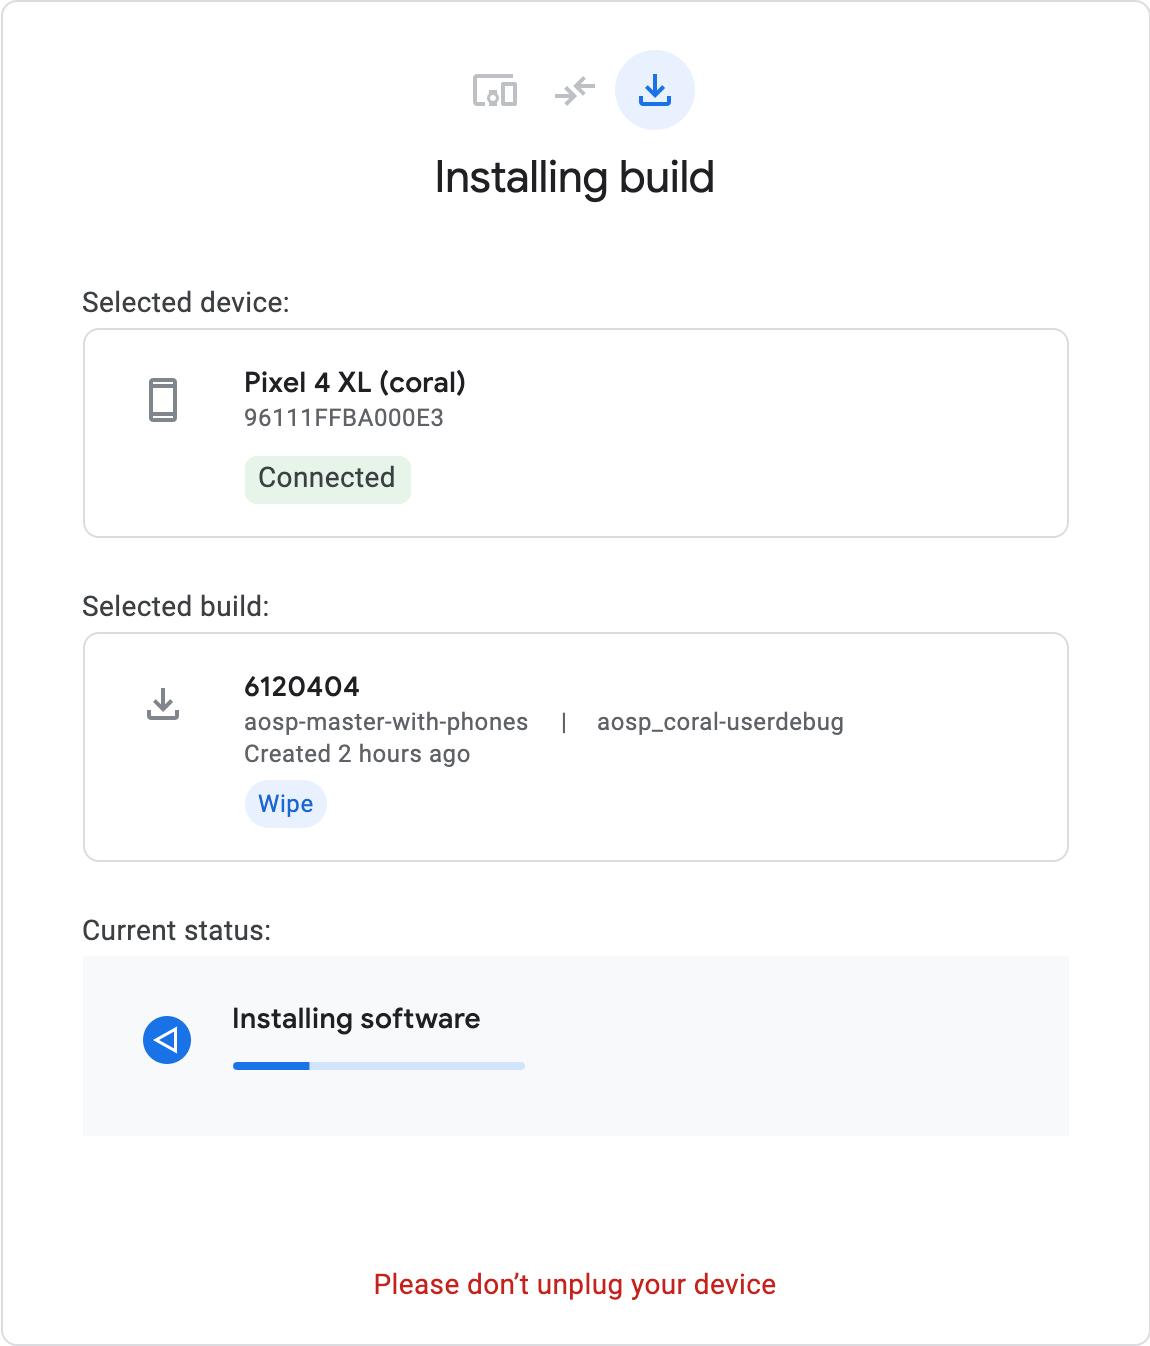 installing build